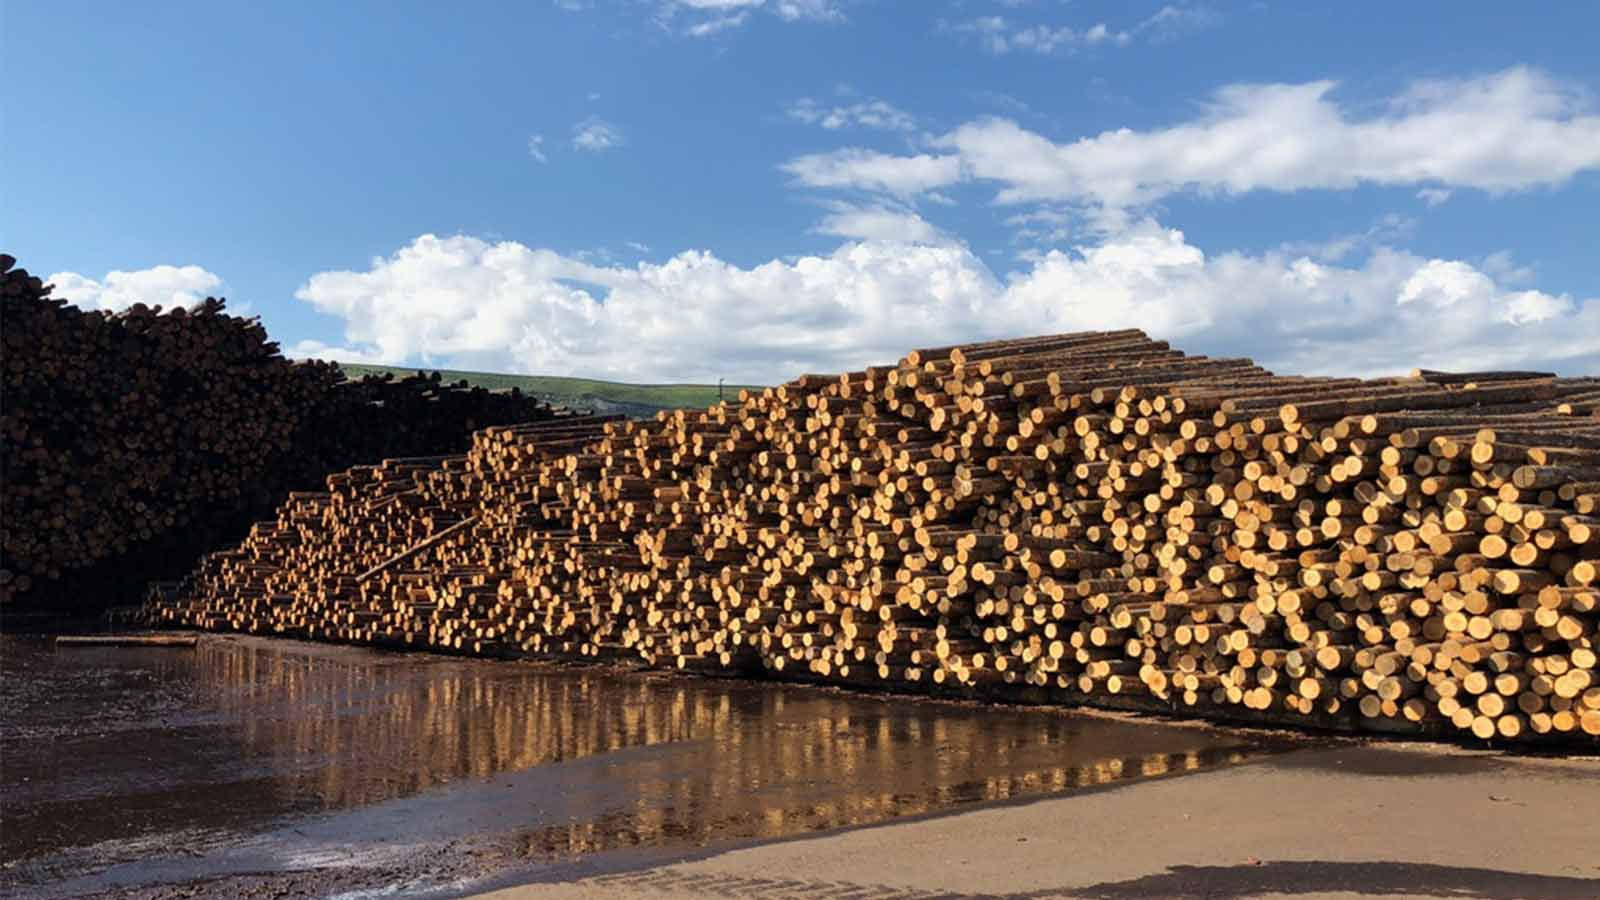 a-large-stockpile-at-a-lumber-yard